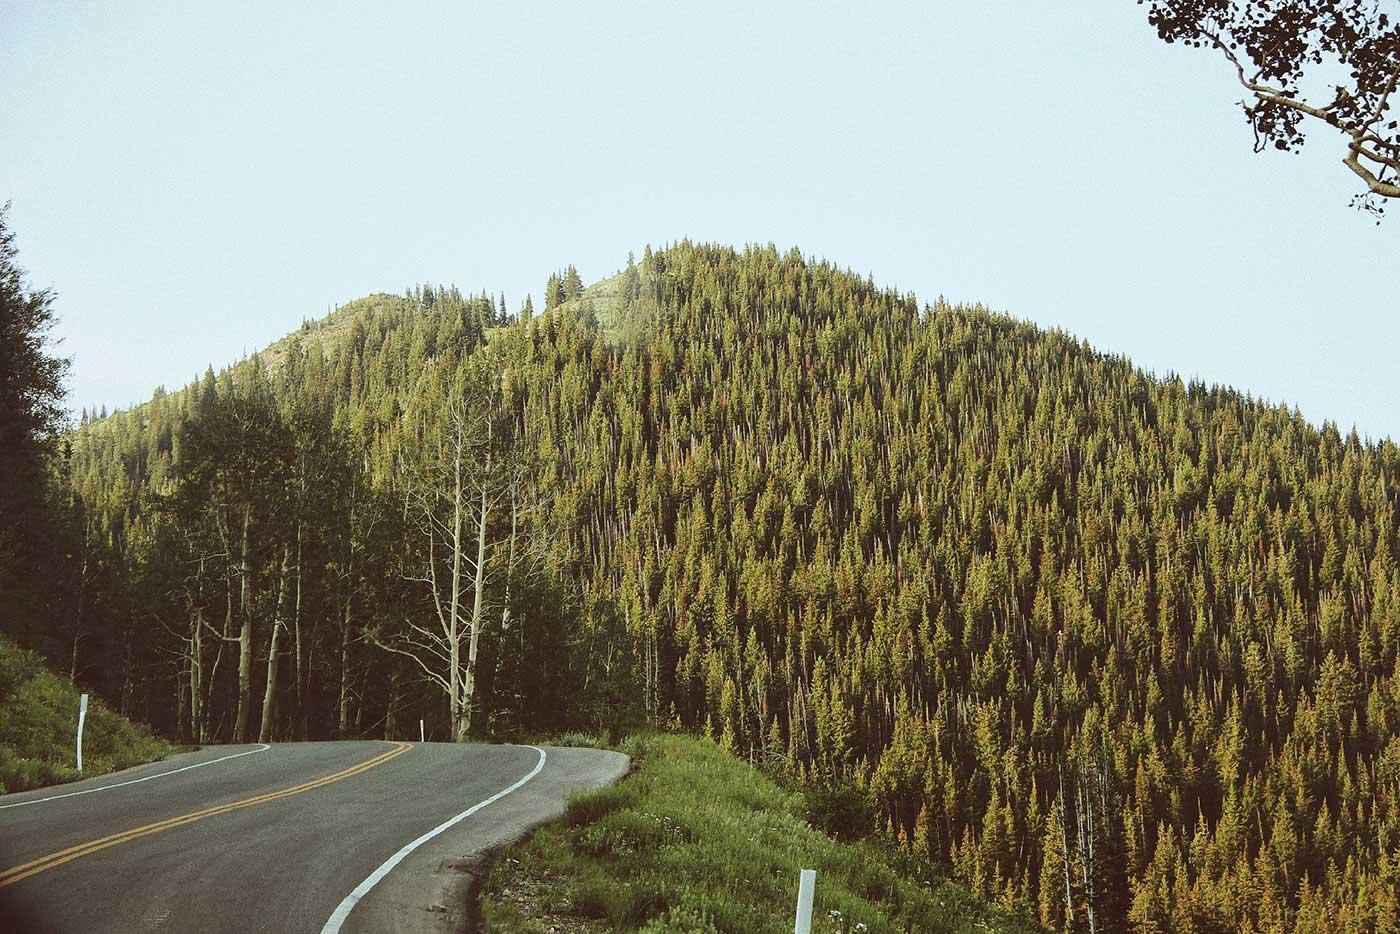 Madison S. Palica - Phenomenology: Utah